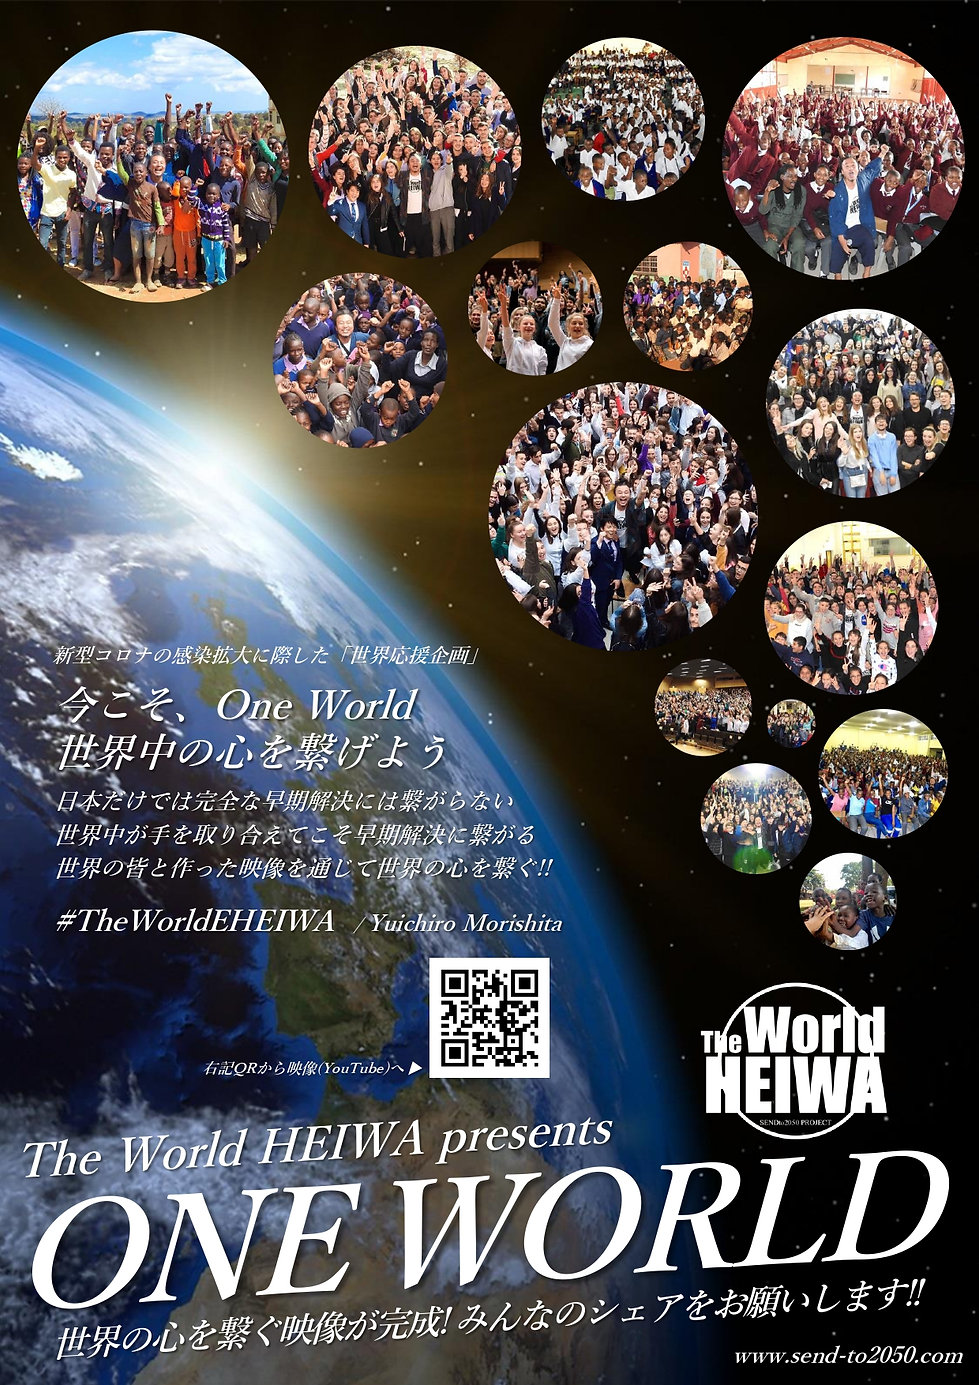 【FLYER.1】「ONE WORLD MOVIE」を世界へ届けるチラシ_pag